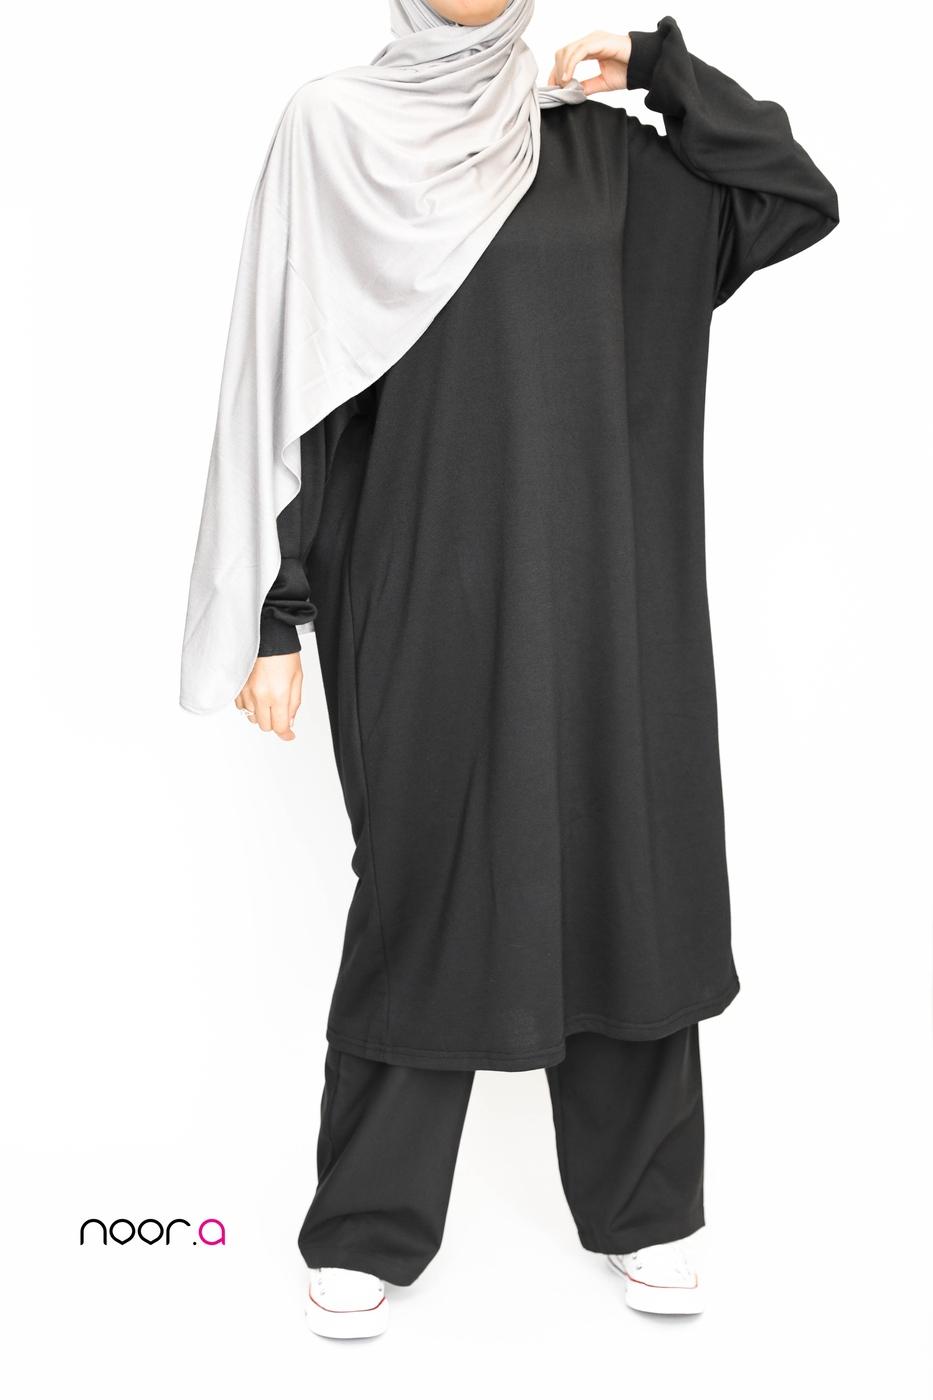 tunique-longue-oversize-comfy-hijab-xxl-viscose-gris (4)